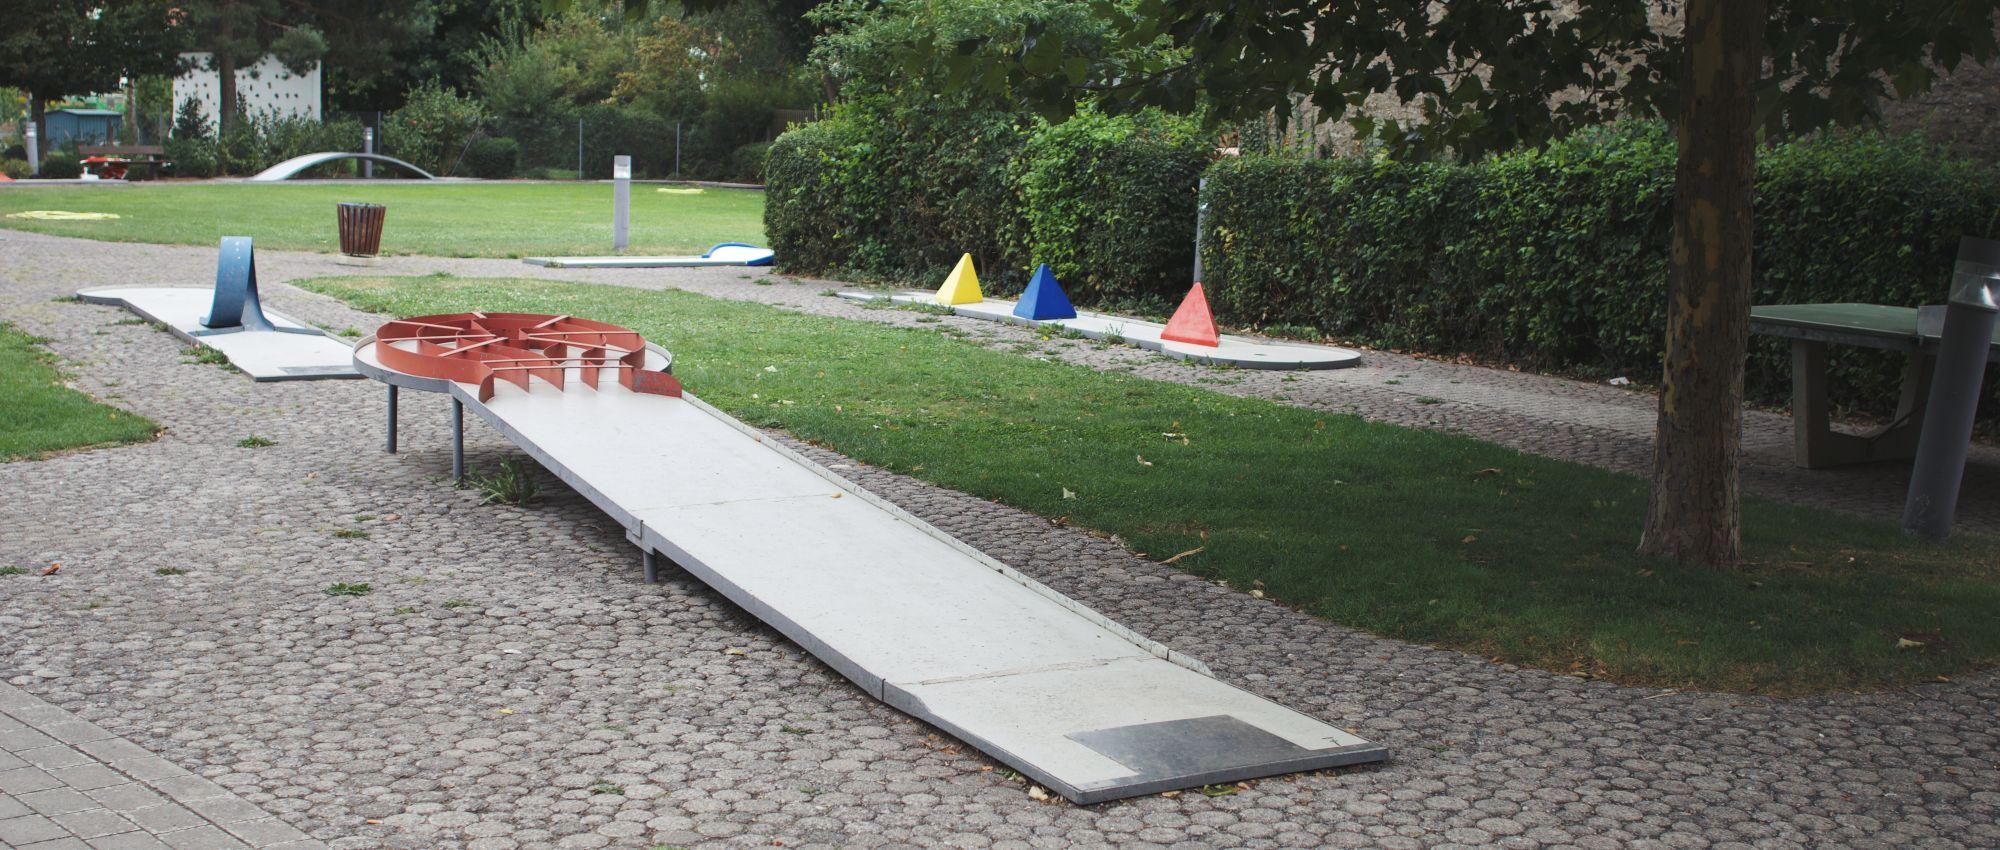 Dürrbachpark Minigolf Bahn 7